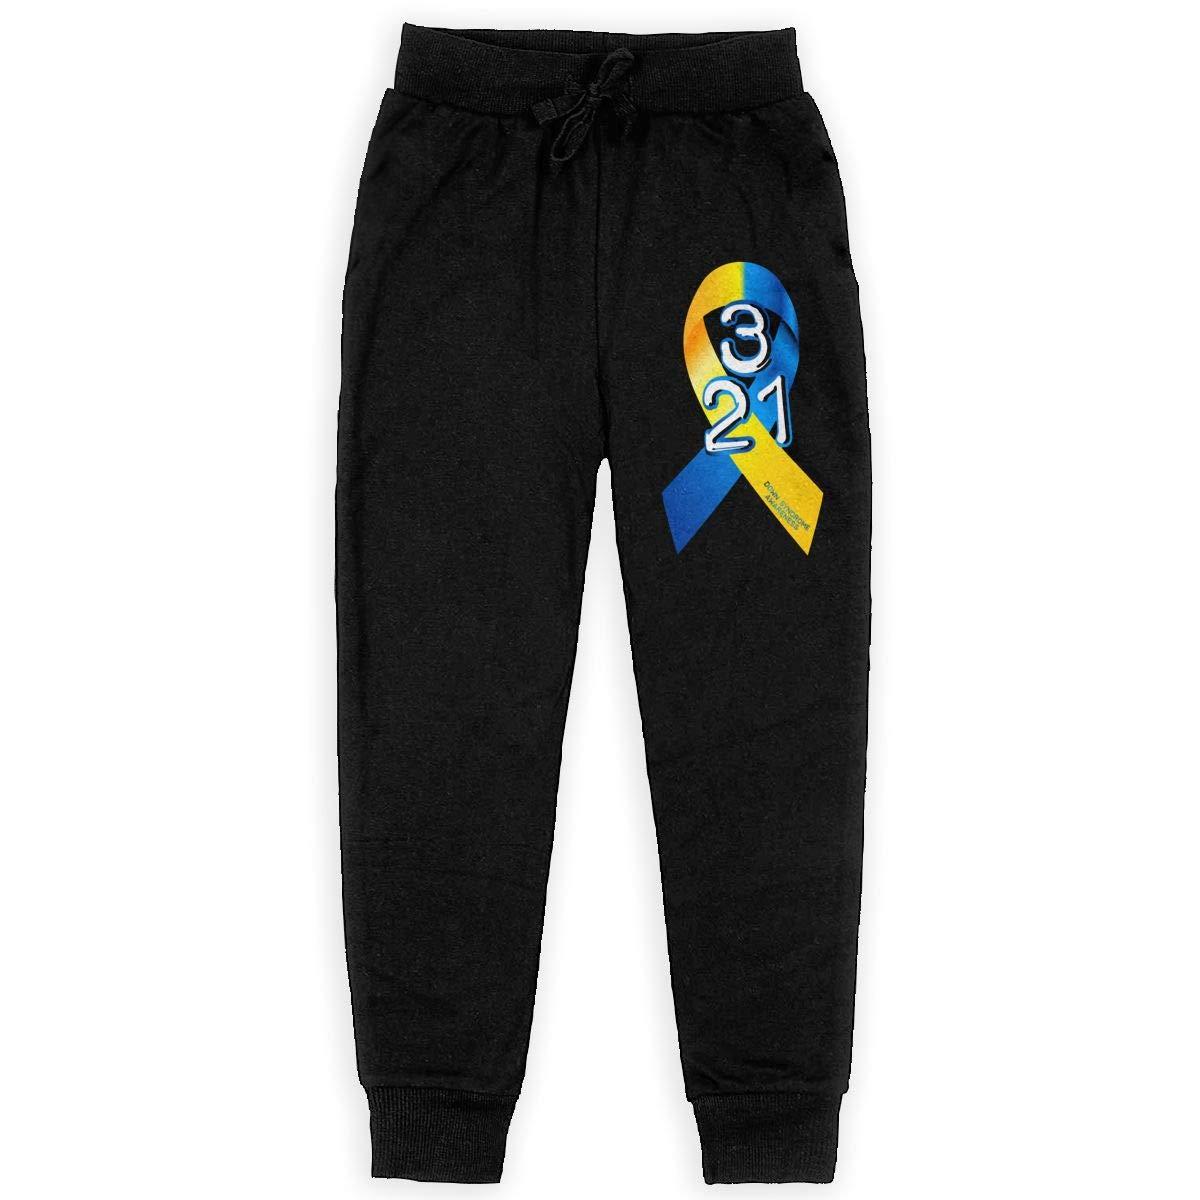 XHAKZM71 Teenagers Teen Girls Down Syndrome Awareness Printed Sweatpants Yoga Jogger Active Pants